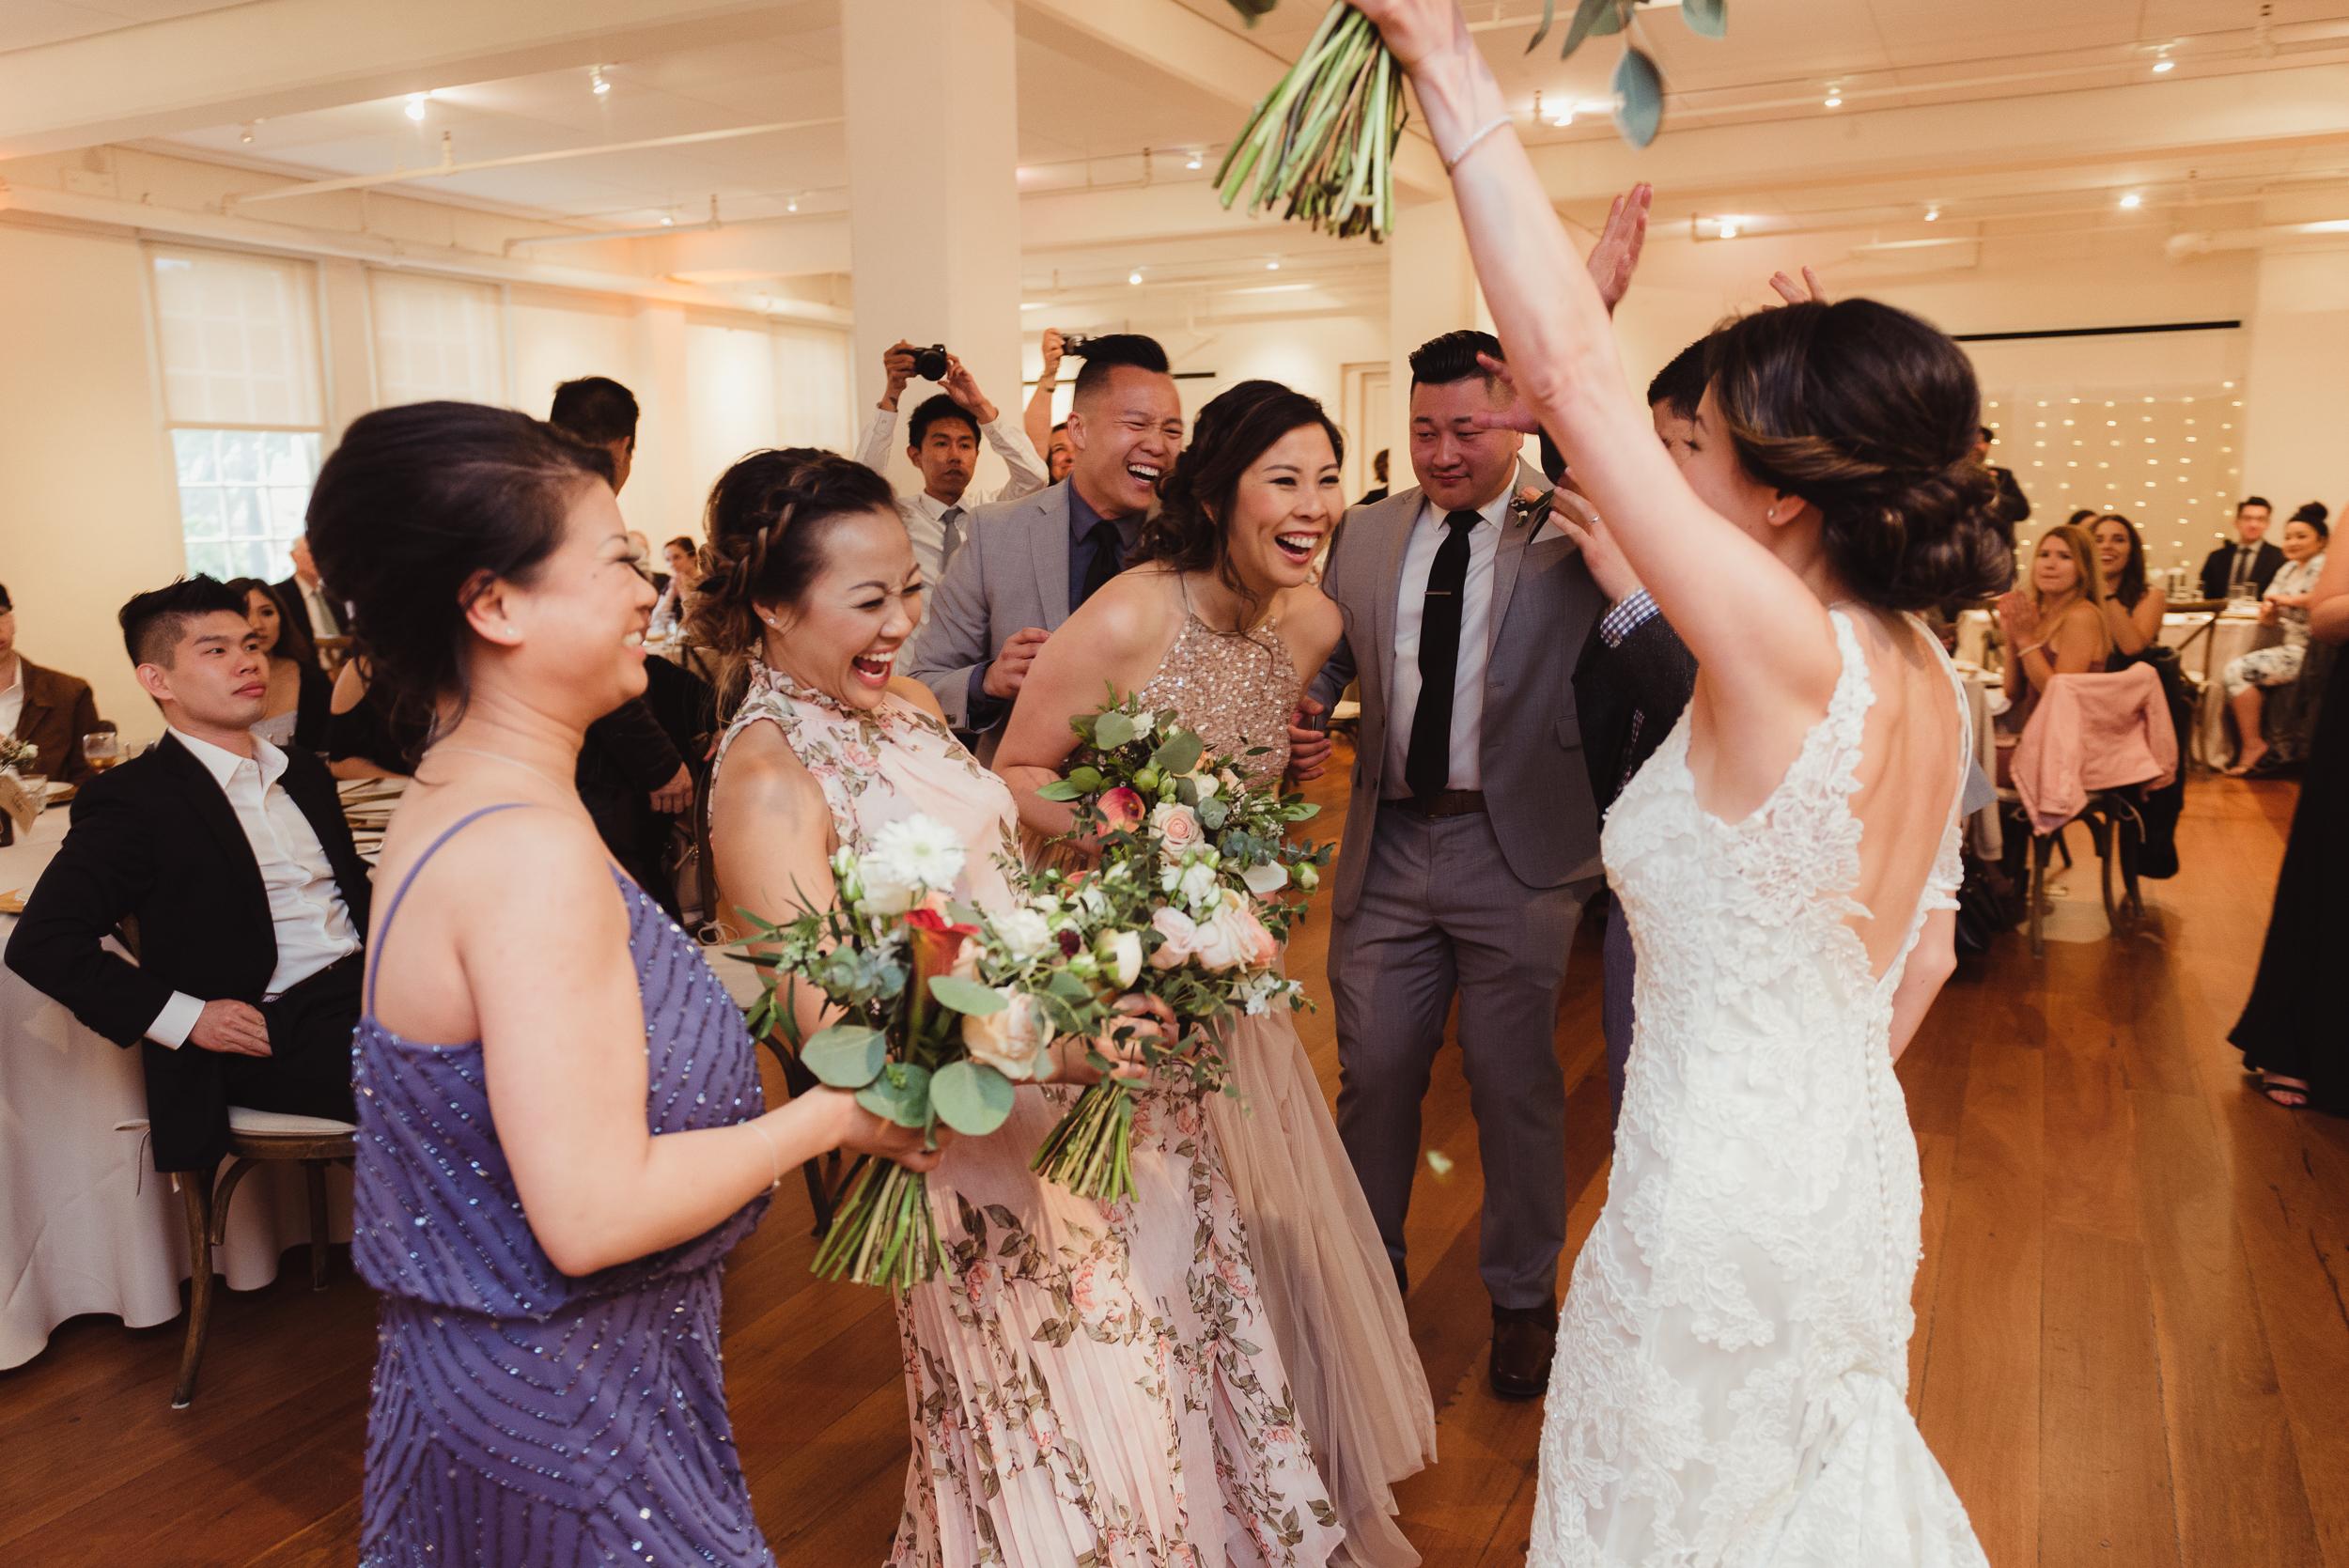 53-san-francisco-film-centre-wedding-vivianchen-429.jpg